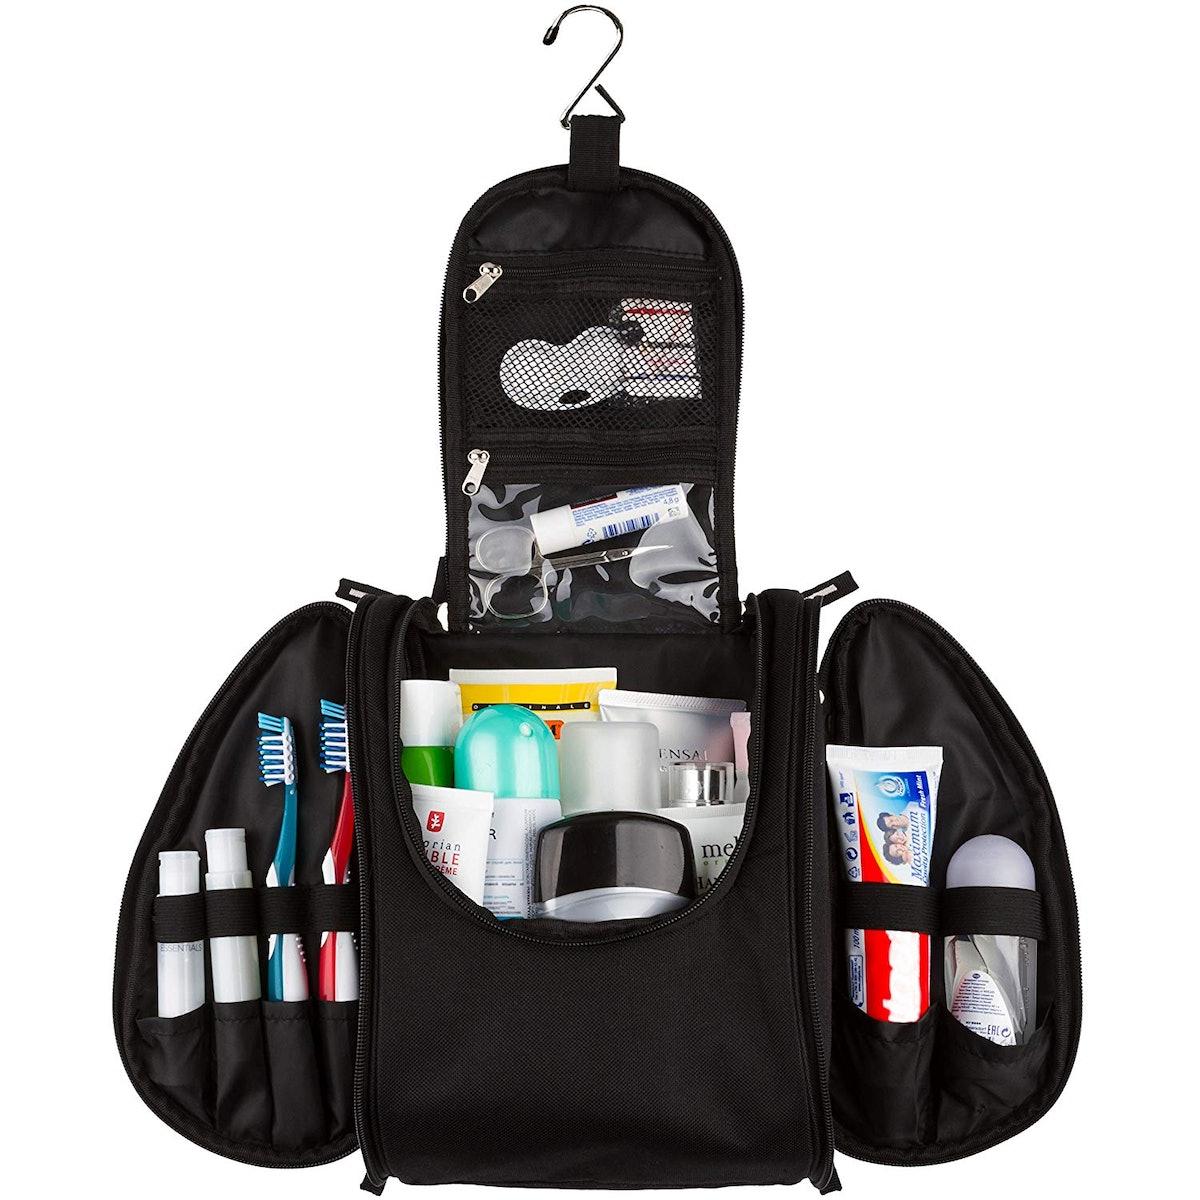 42 Travel Toiletry Bag